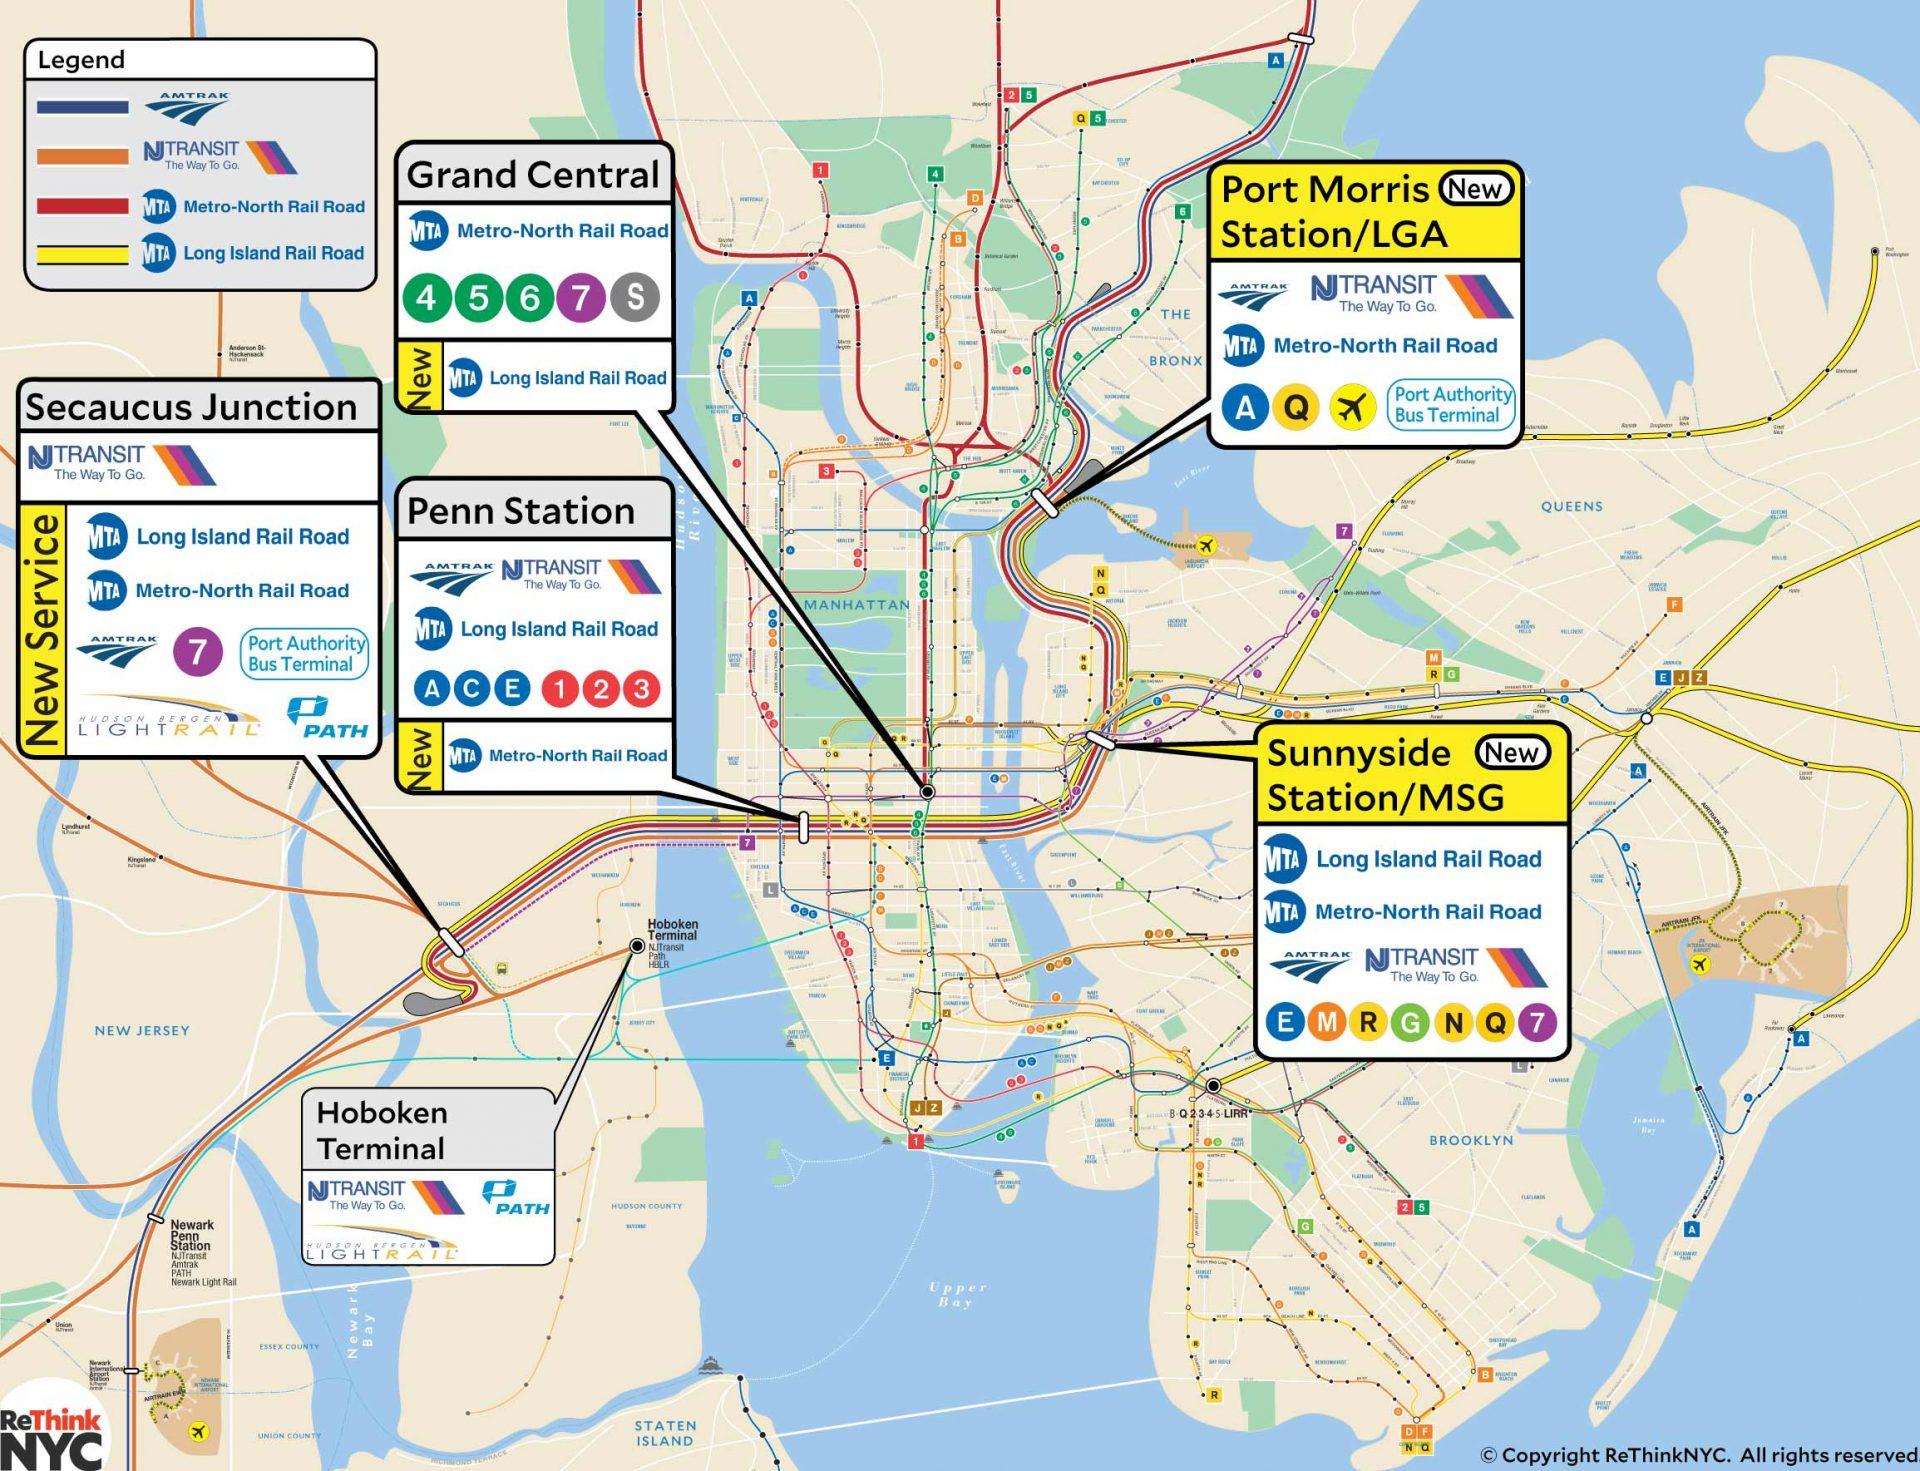 ReThinkNYC Plan ReThink Studio – Map of Greater New York City Area